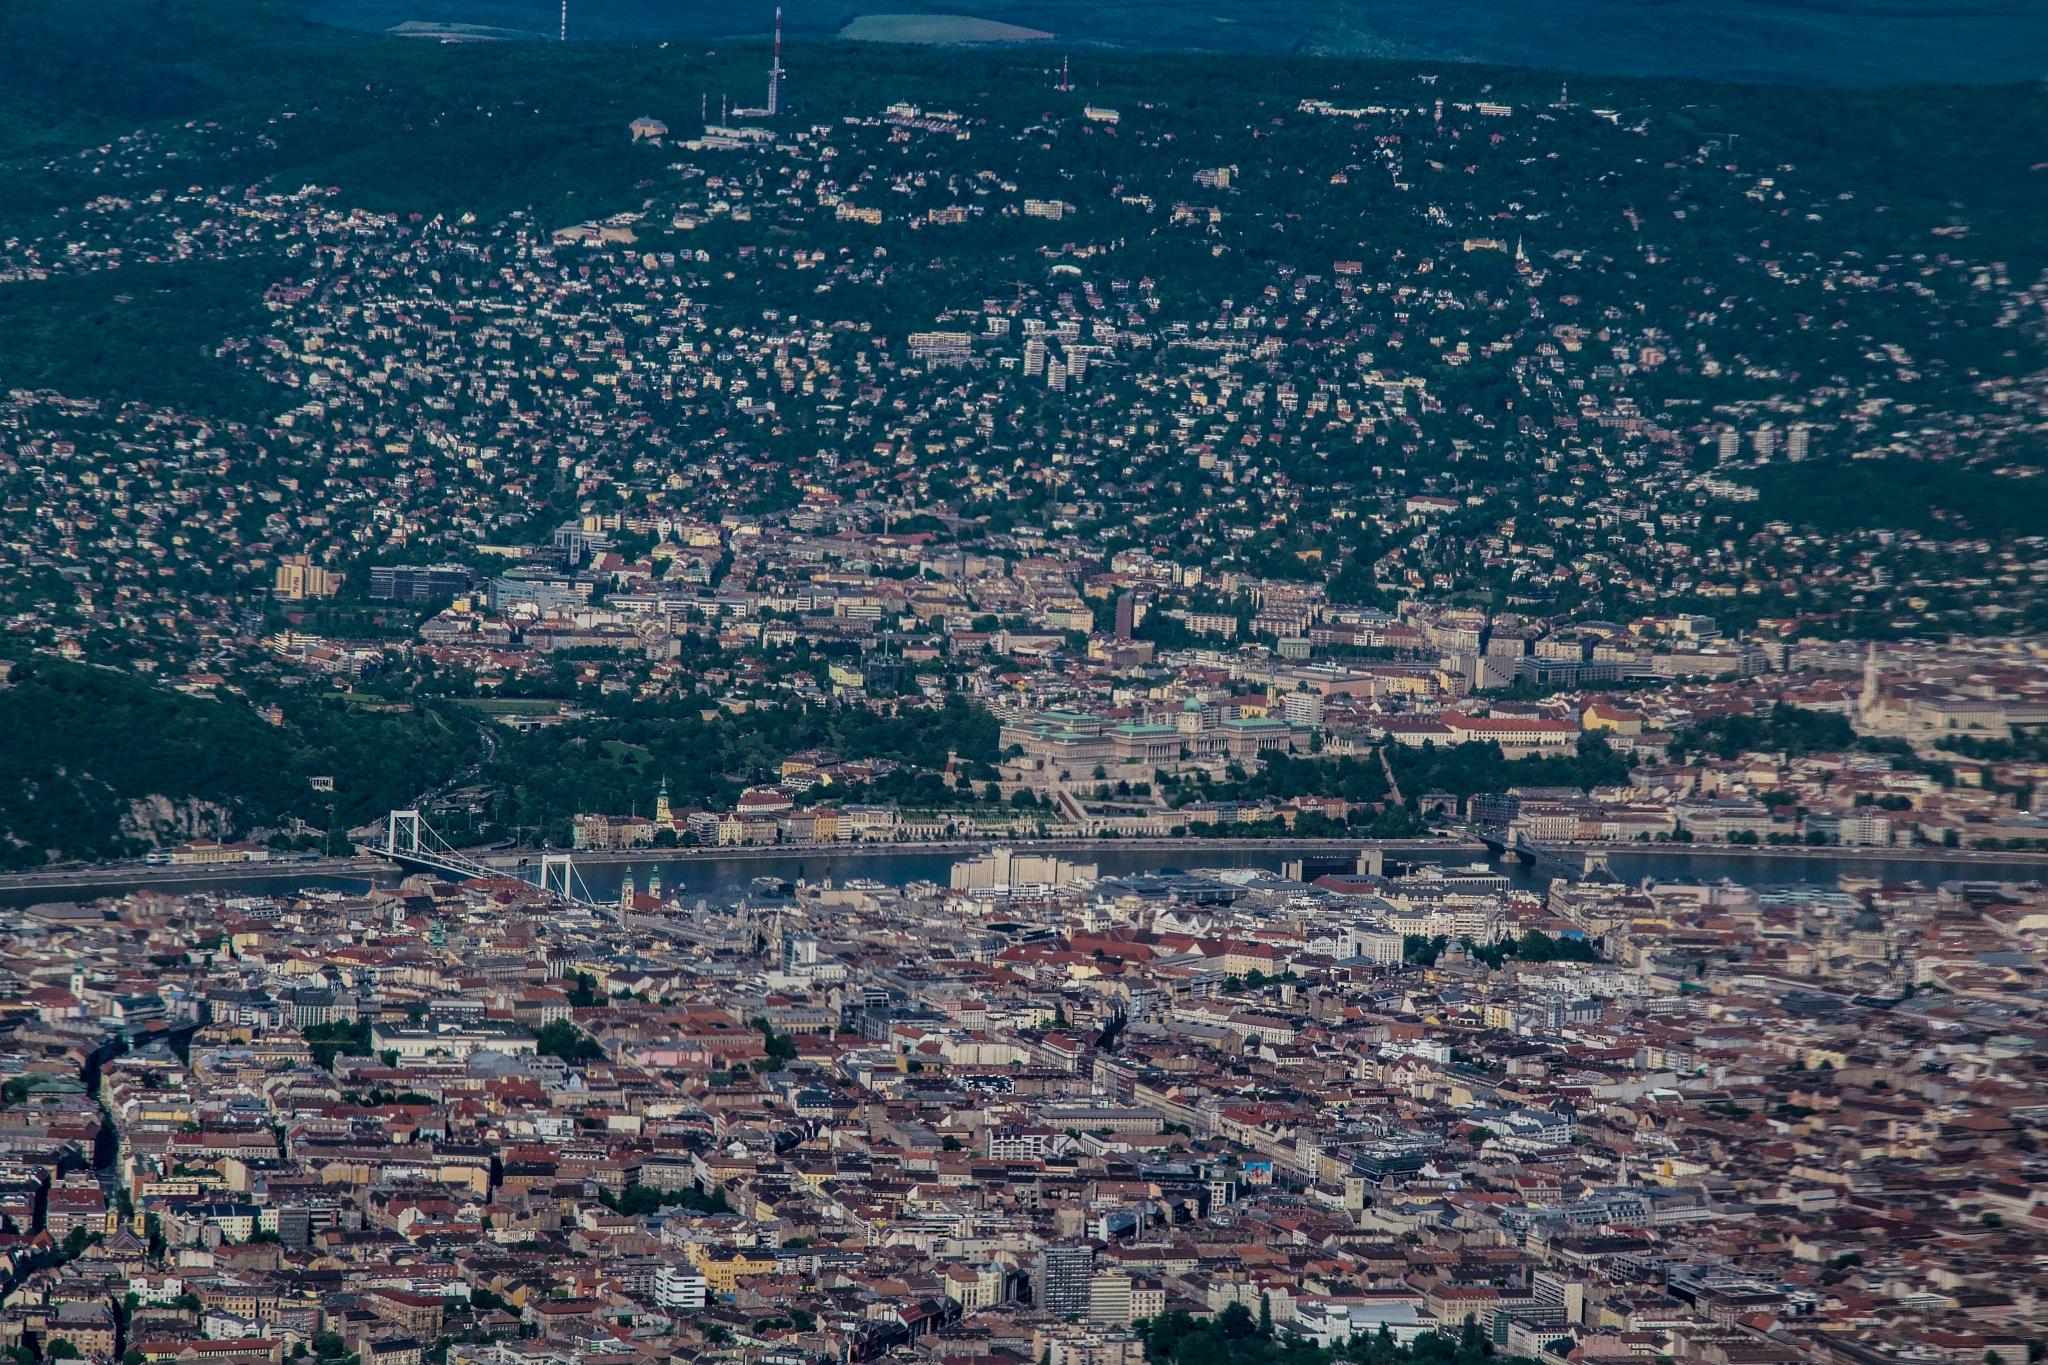 Budapest from the air by Péter Hóbor